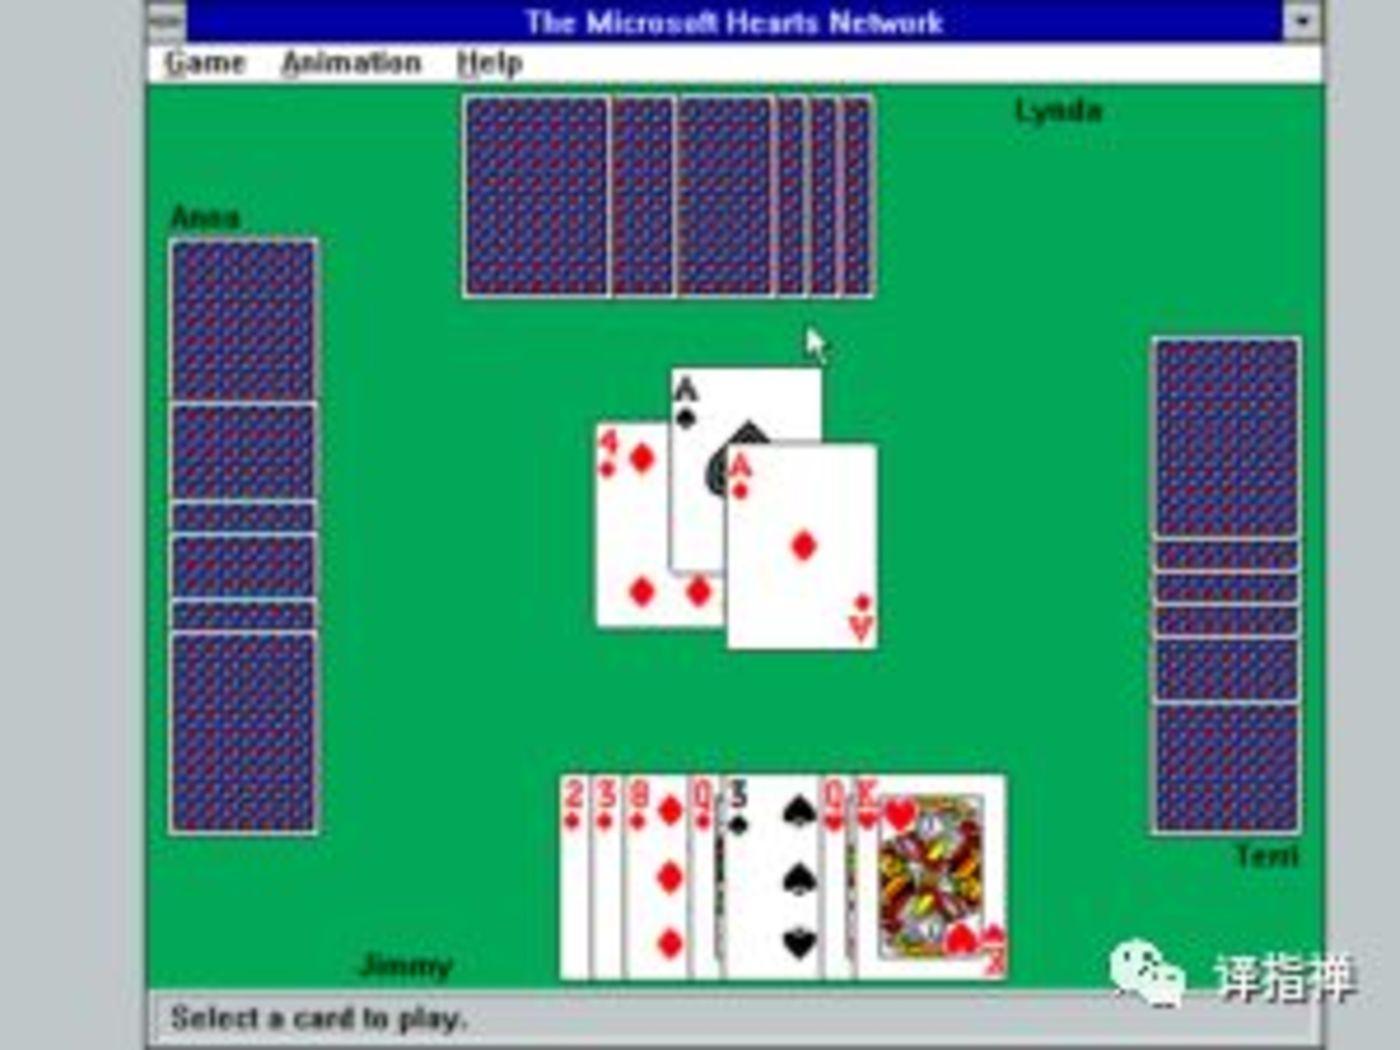 图为:微软卡牌游戏Hearts Network界面